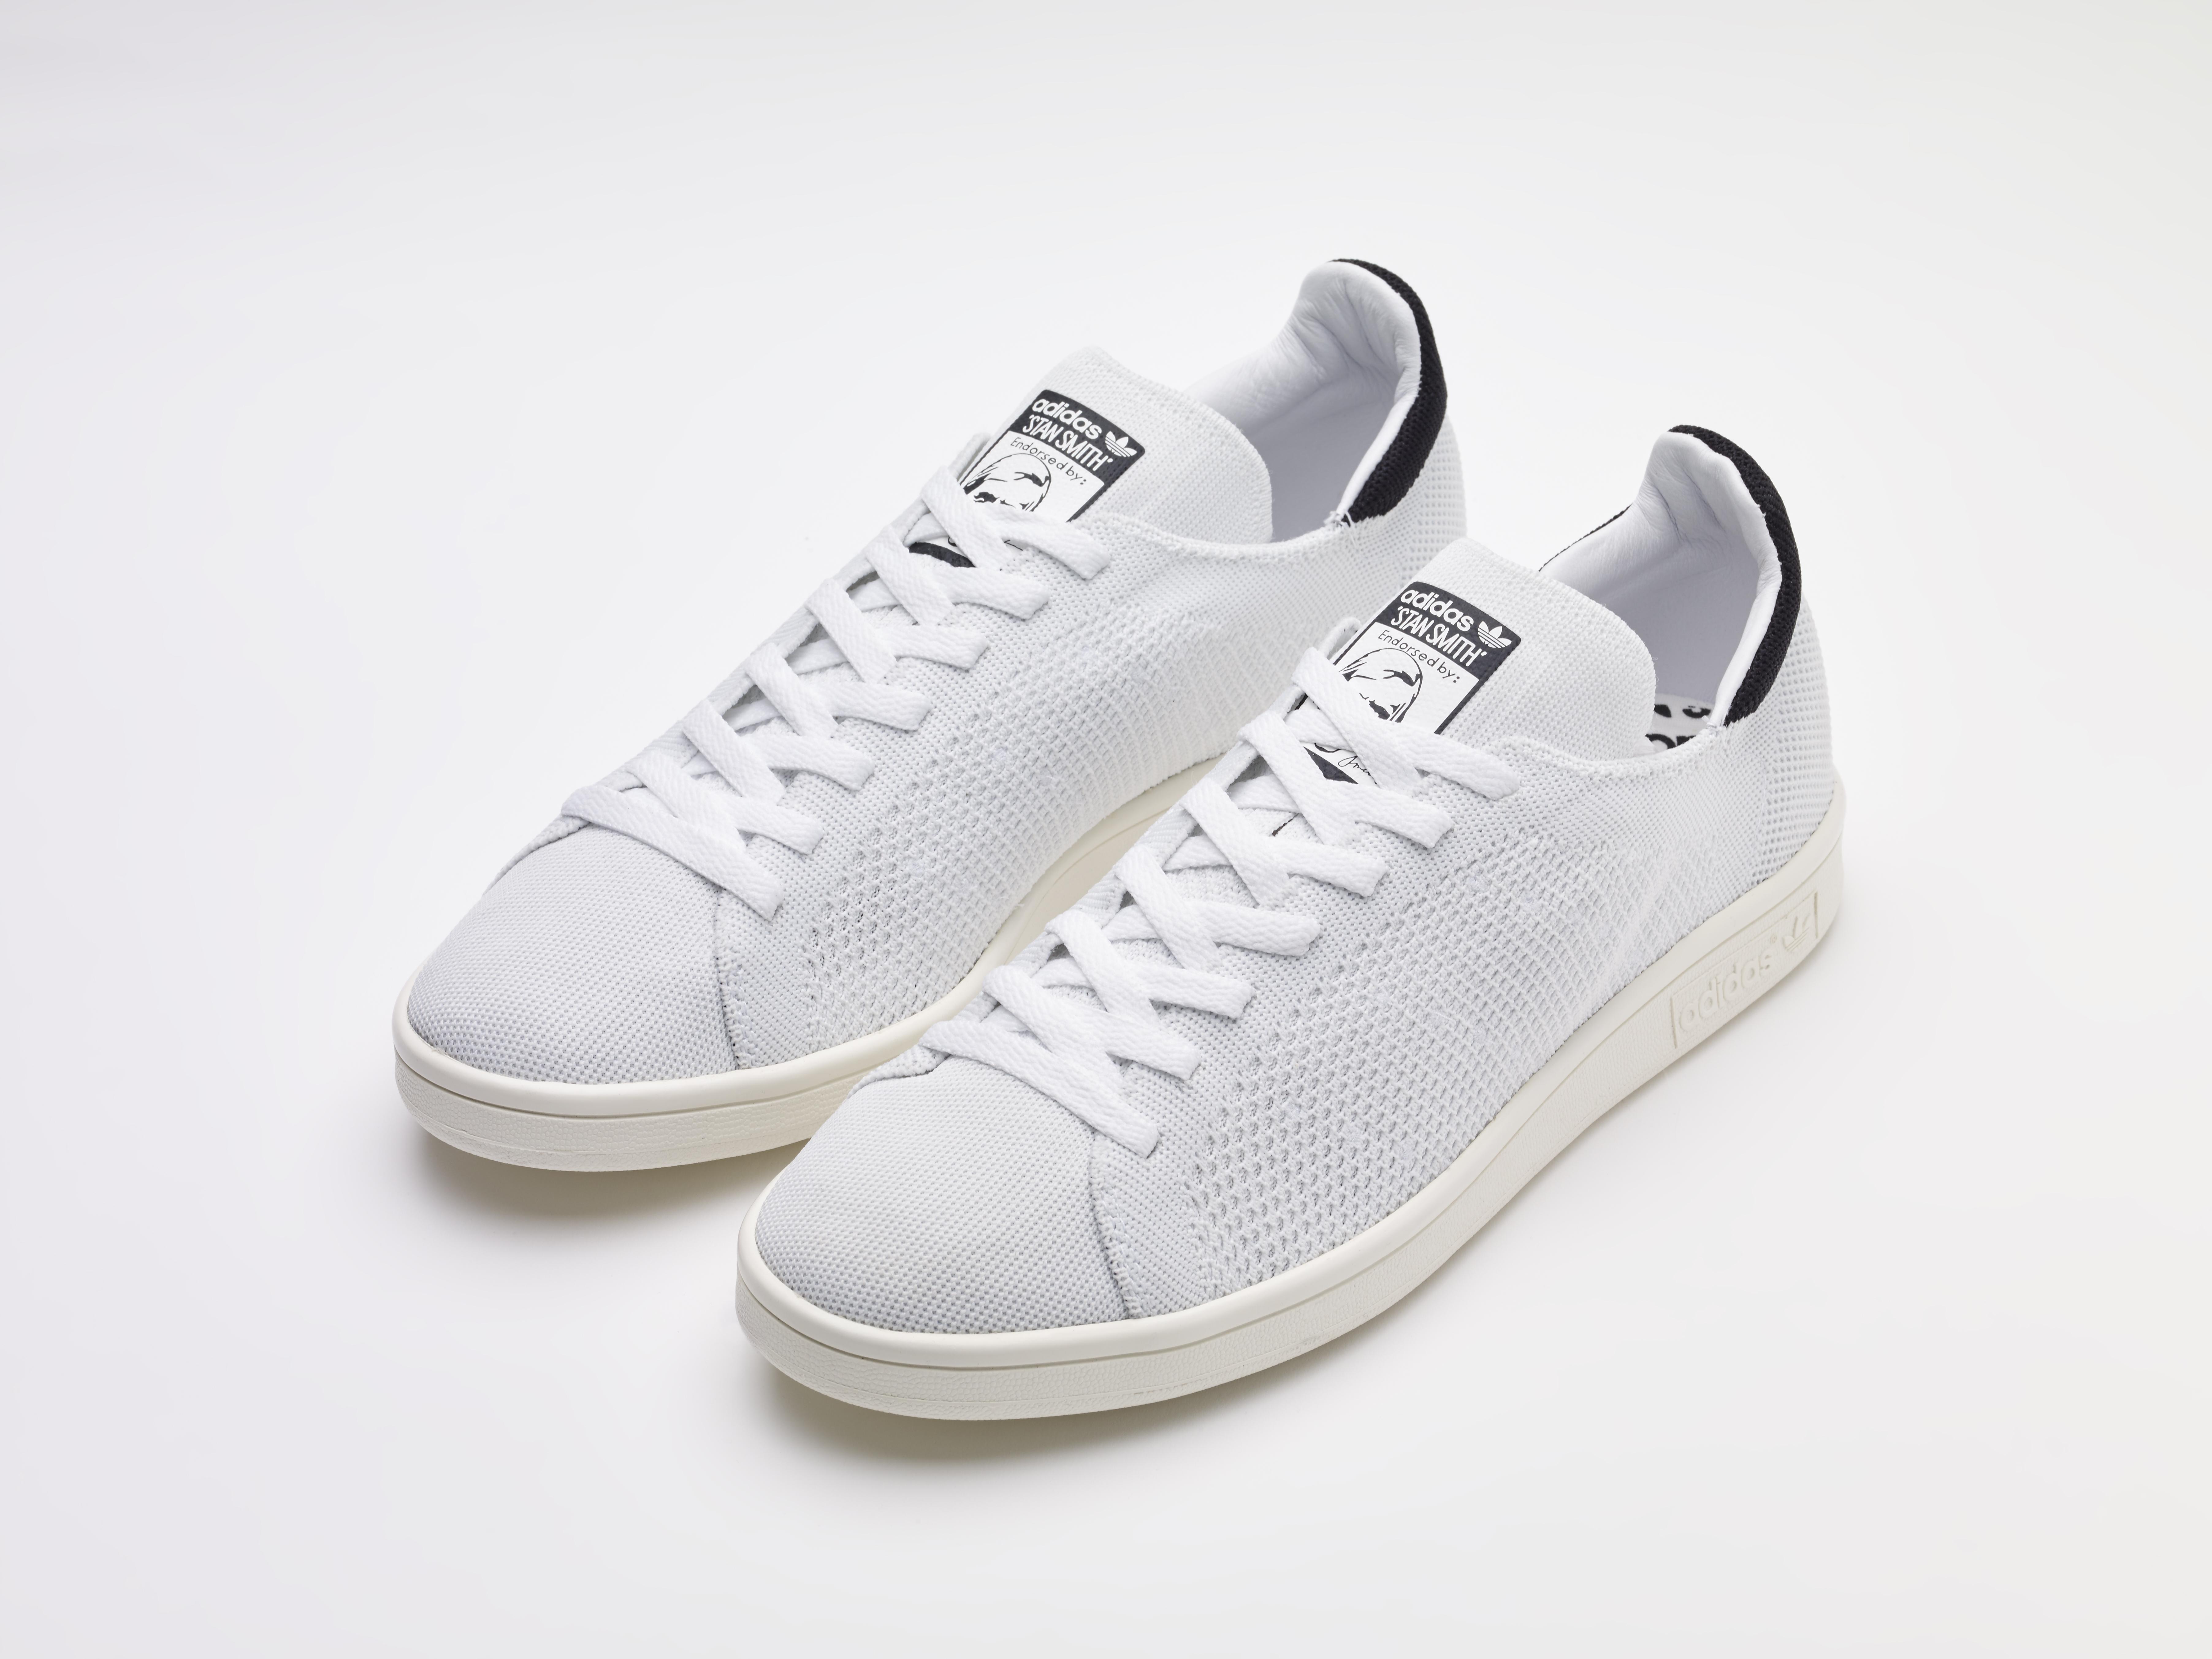 pas mal e2861 f0f36 adidas Originals Stan Smith Primeknit - Global Release Date ...